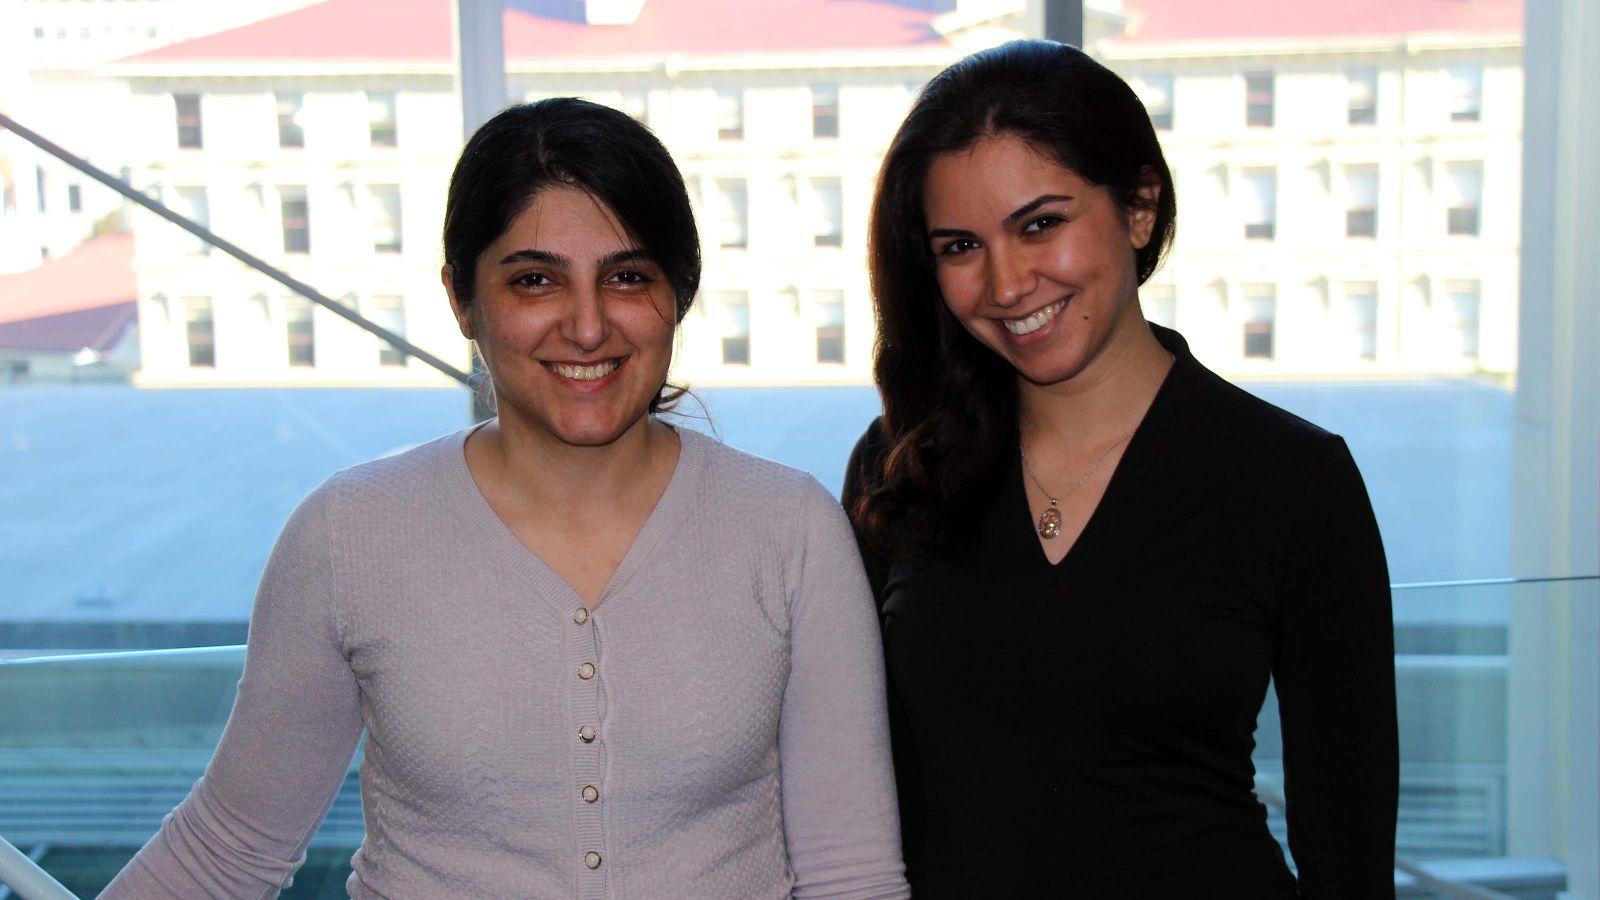 Dr Nazila Alinaghi and Hanna Habibi